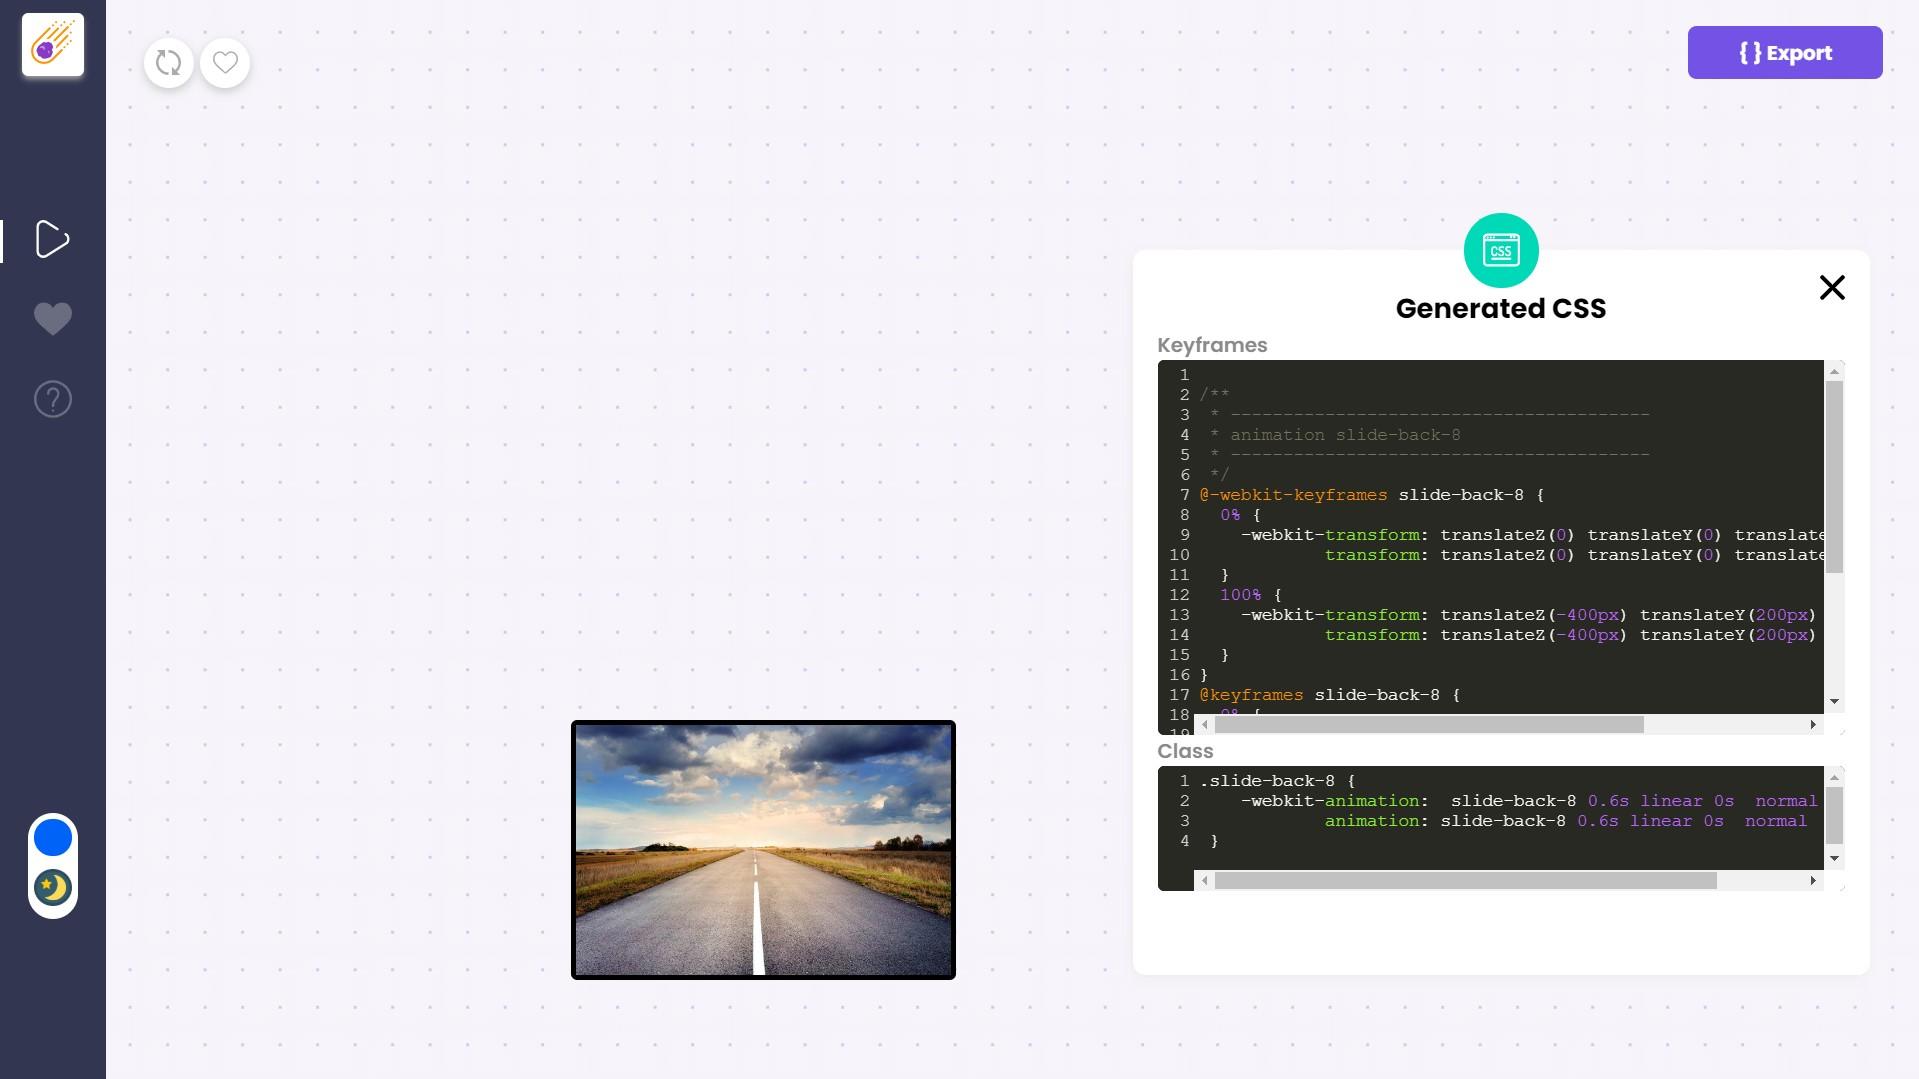 Web Development Software, Animatorify - CSS Animation Creator Screenshot